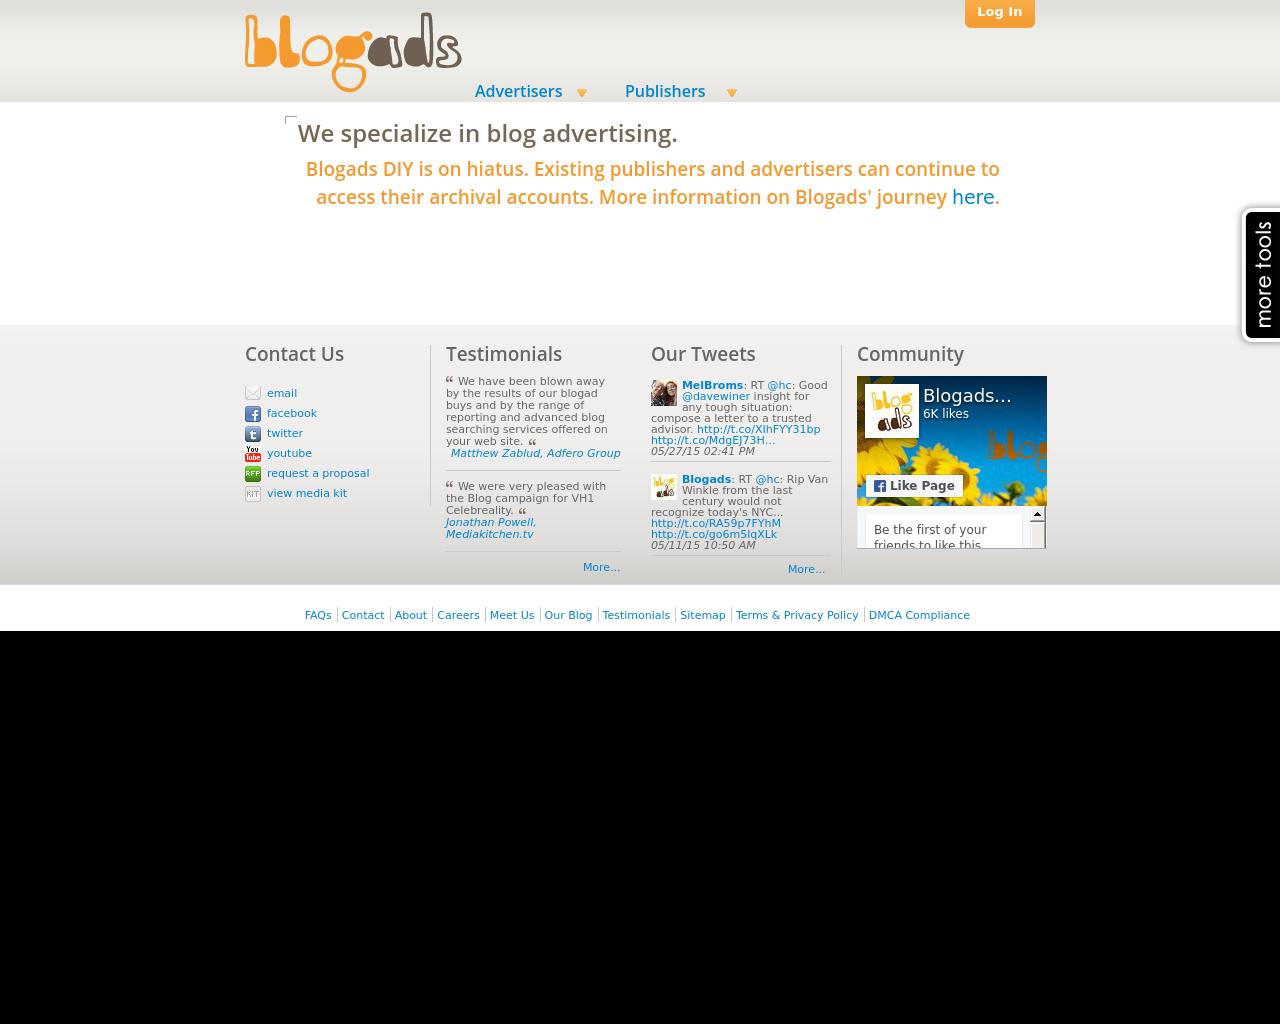 LiberalOasis-Advertising-Reviews-Pricing